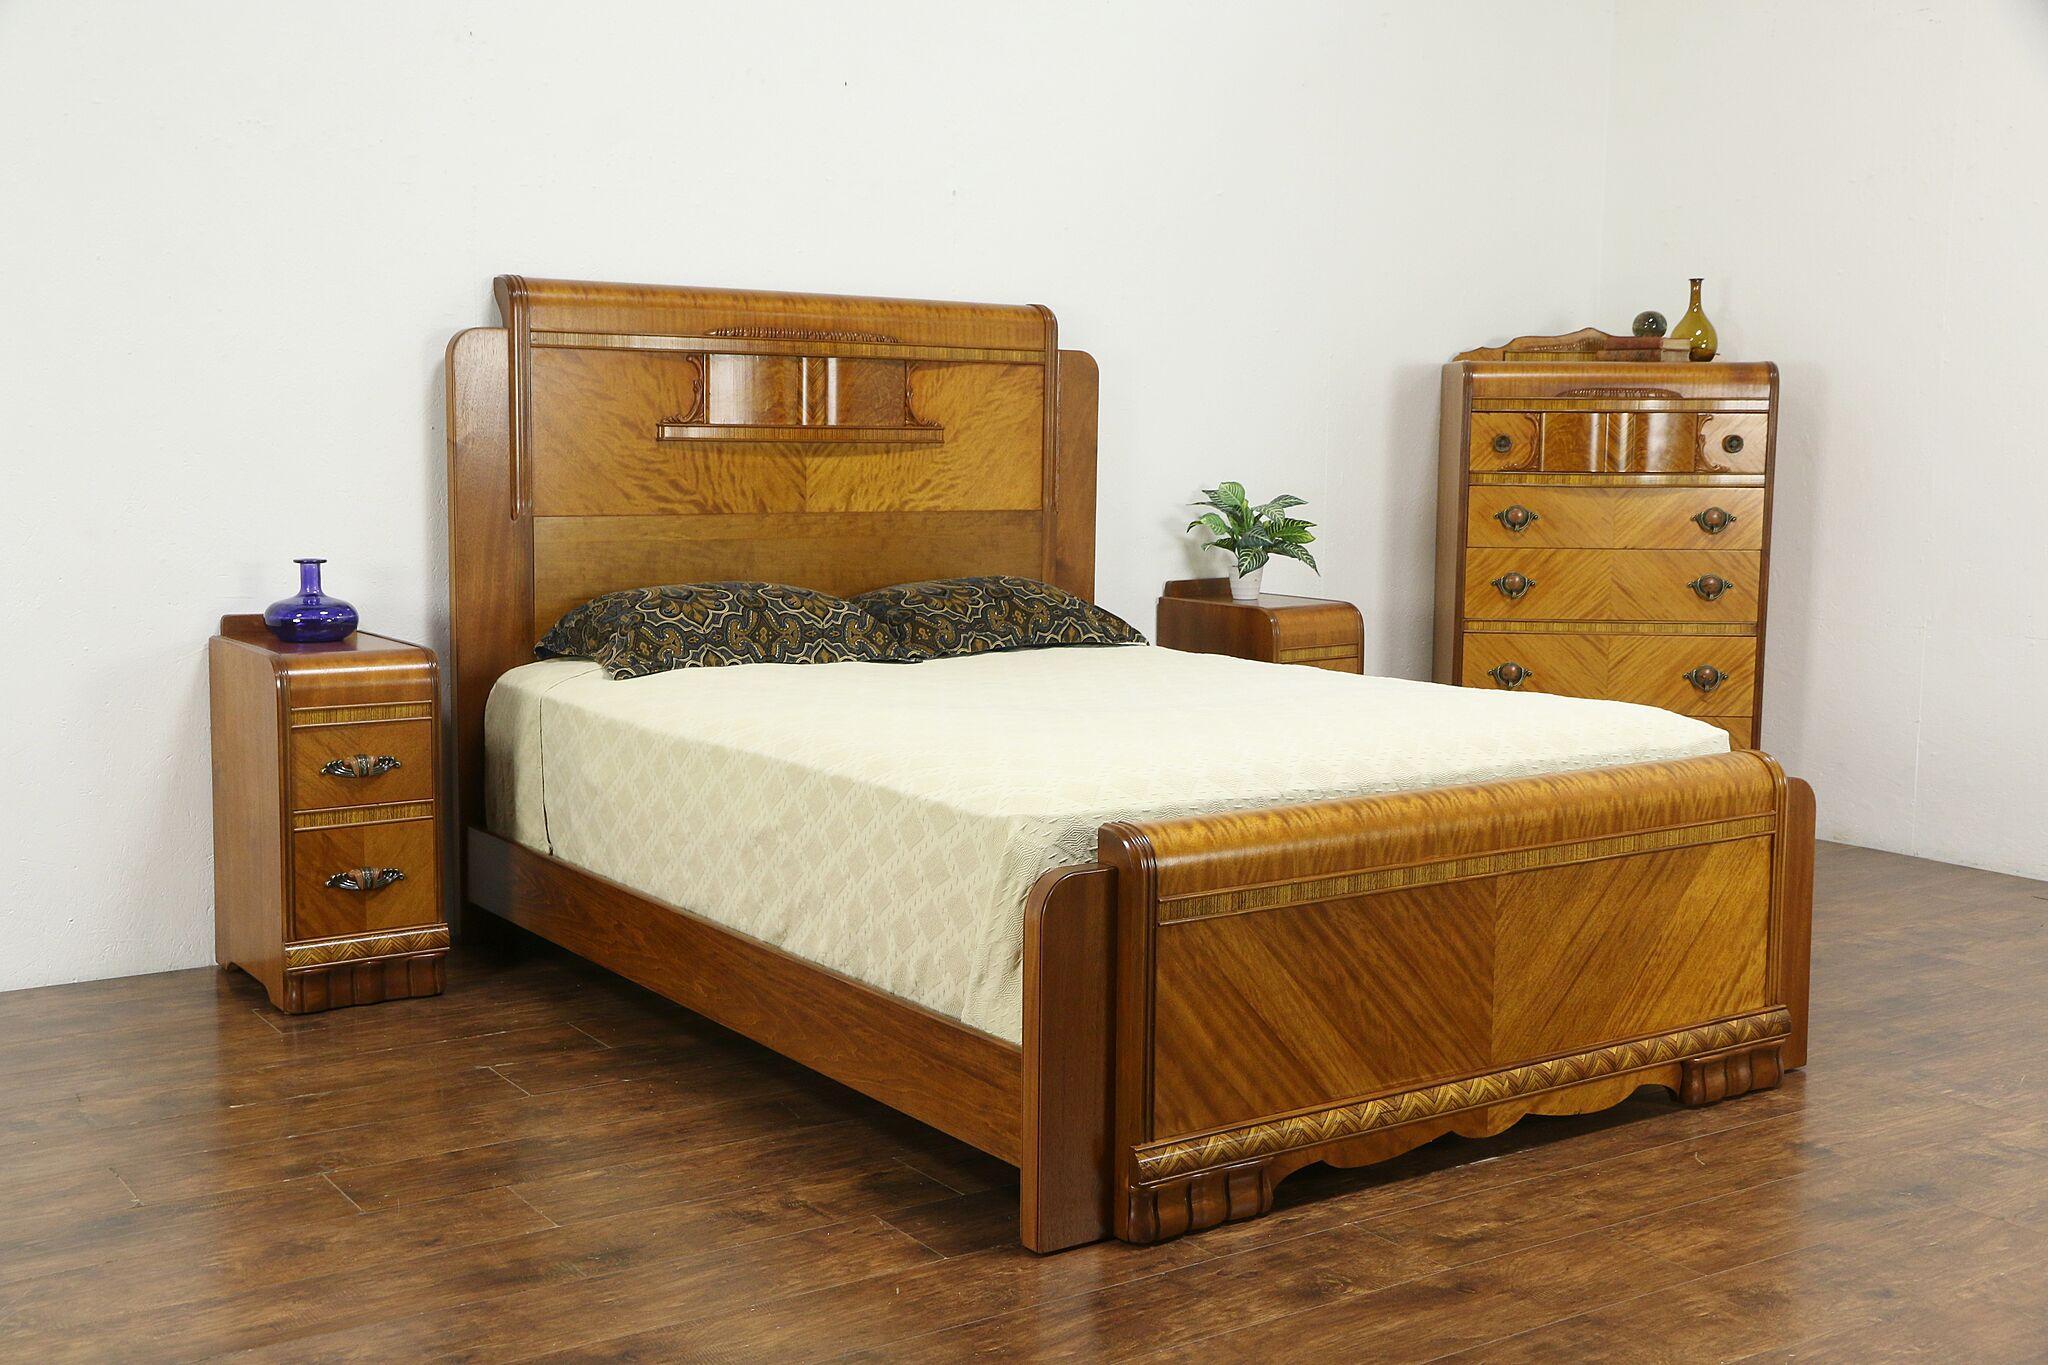 Sold Art Deco Waterfall Vintage Bedroom Set Queen Size Bed Chest Nightstands 35250 Harp Gallery Antiques Furniture